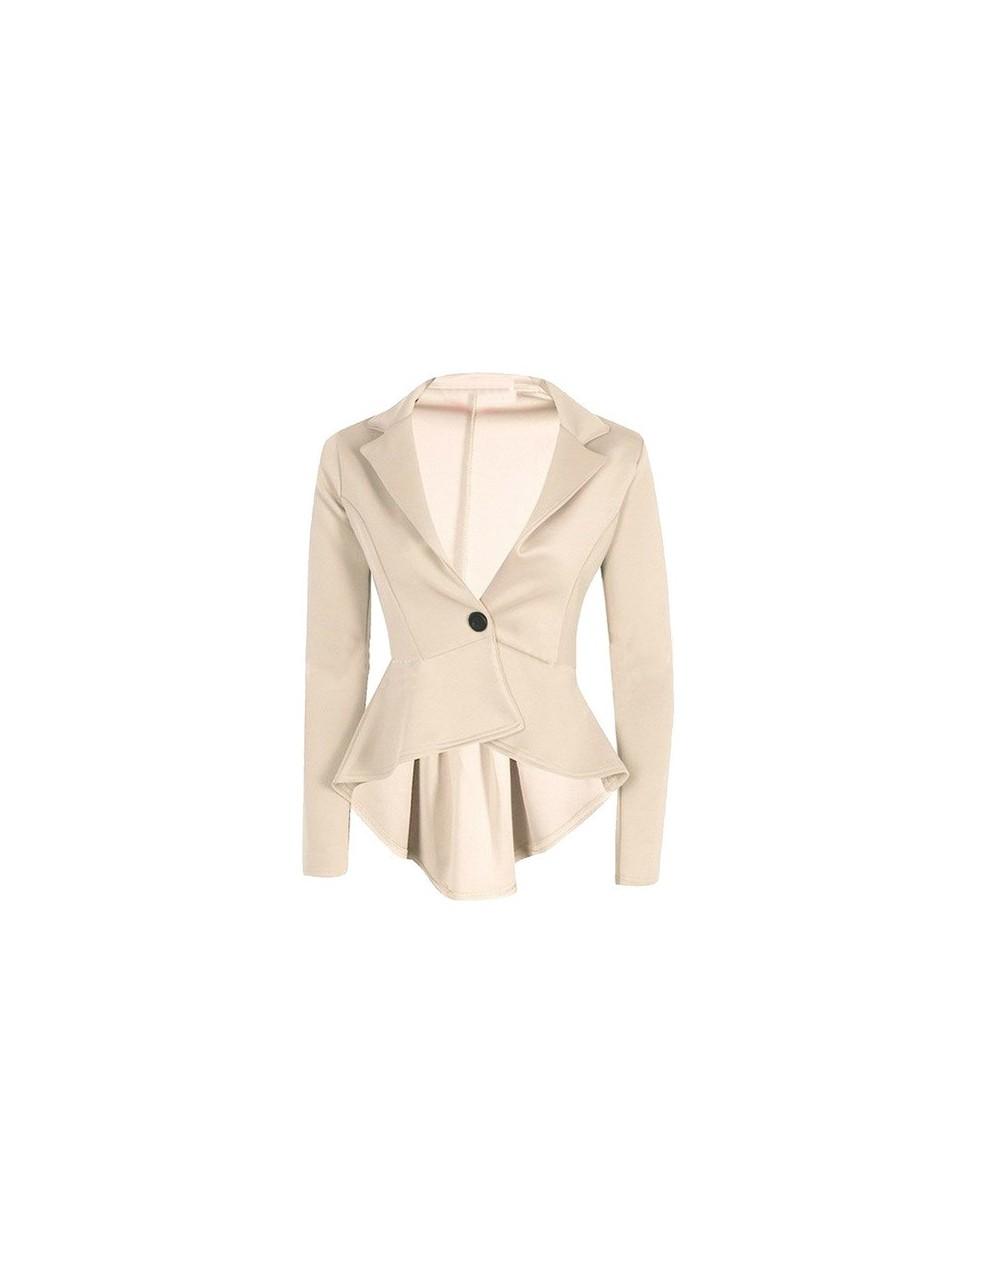 blazer women fashion cropped Blazer Jacket Outwear 2019 blazer mujer Slim Fit Peplum women suits d90523 - Beige - 4641329470...